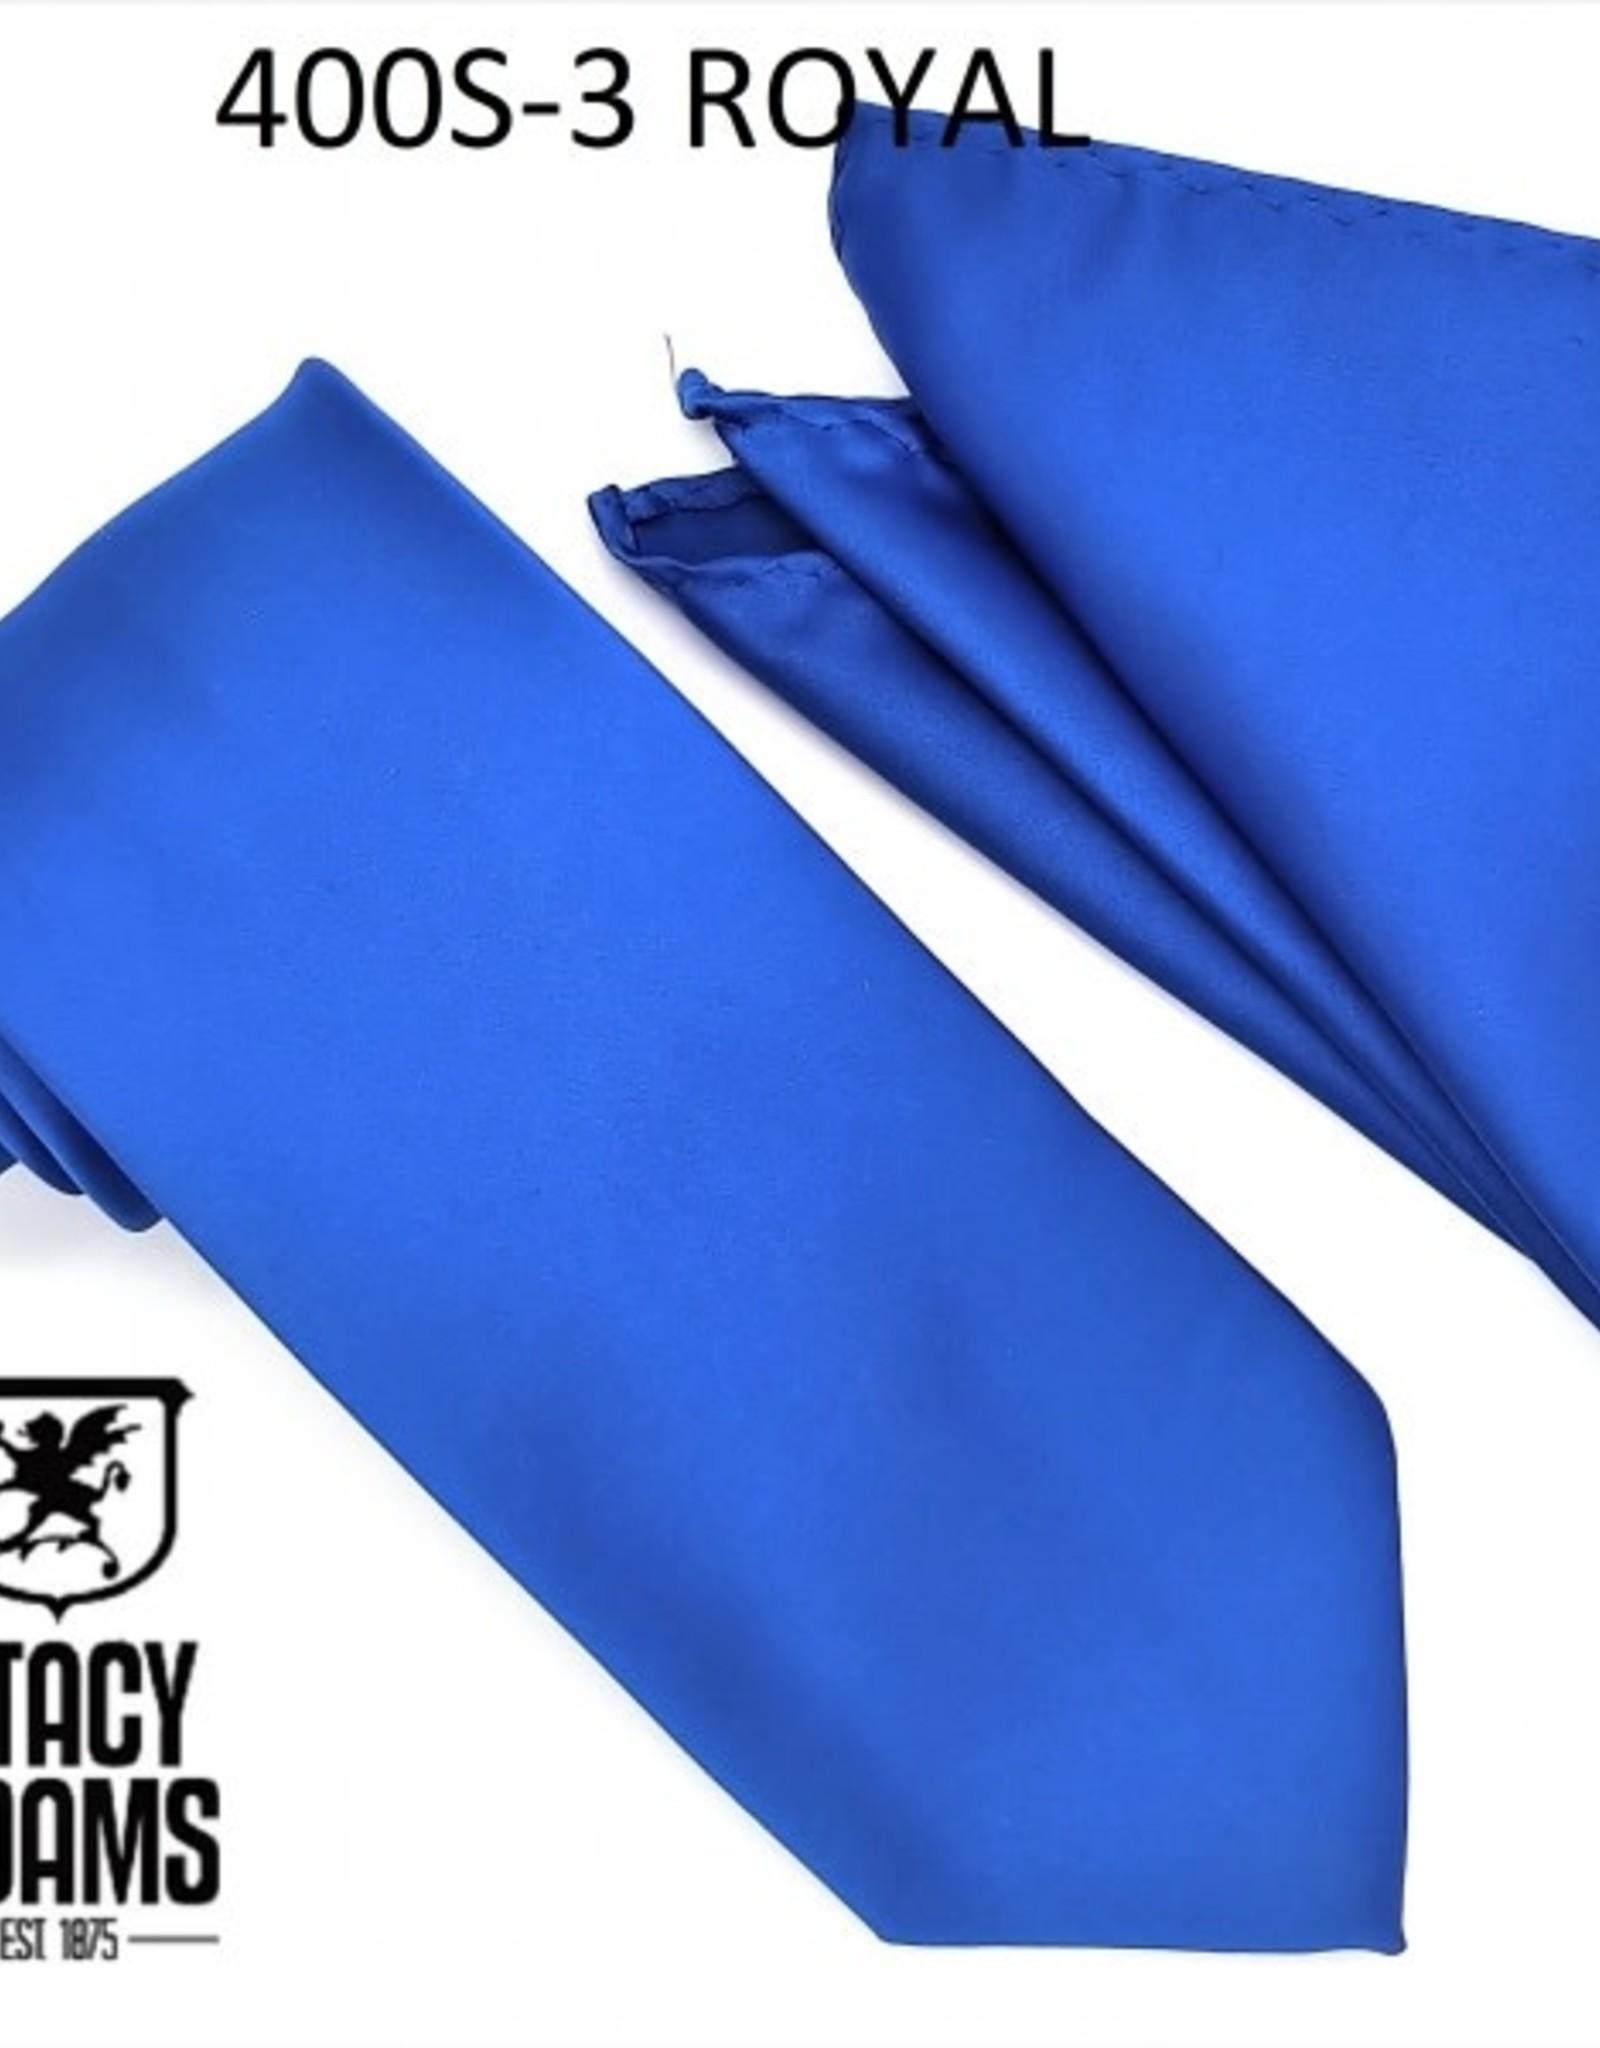 Stacy Adams Tie Stacy Adams Reg 400S-3 Royal